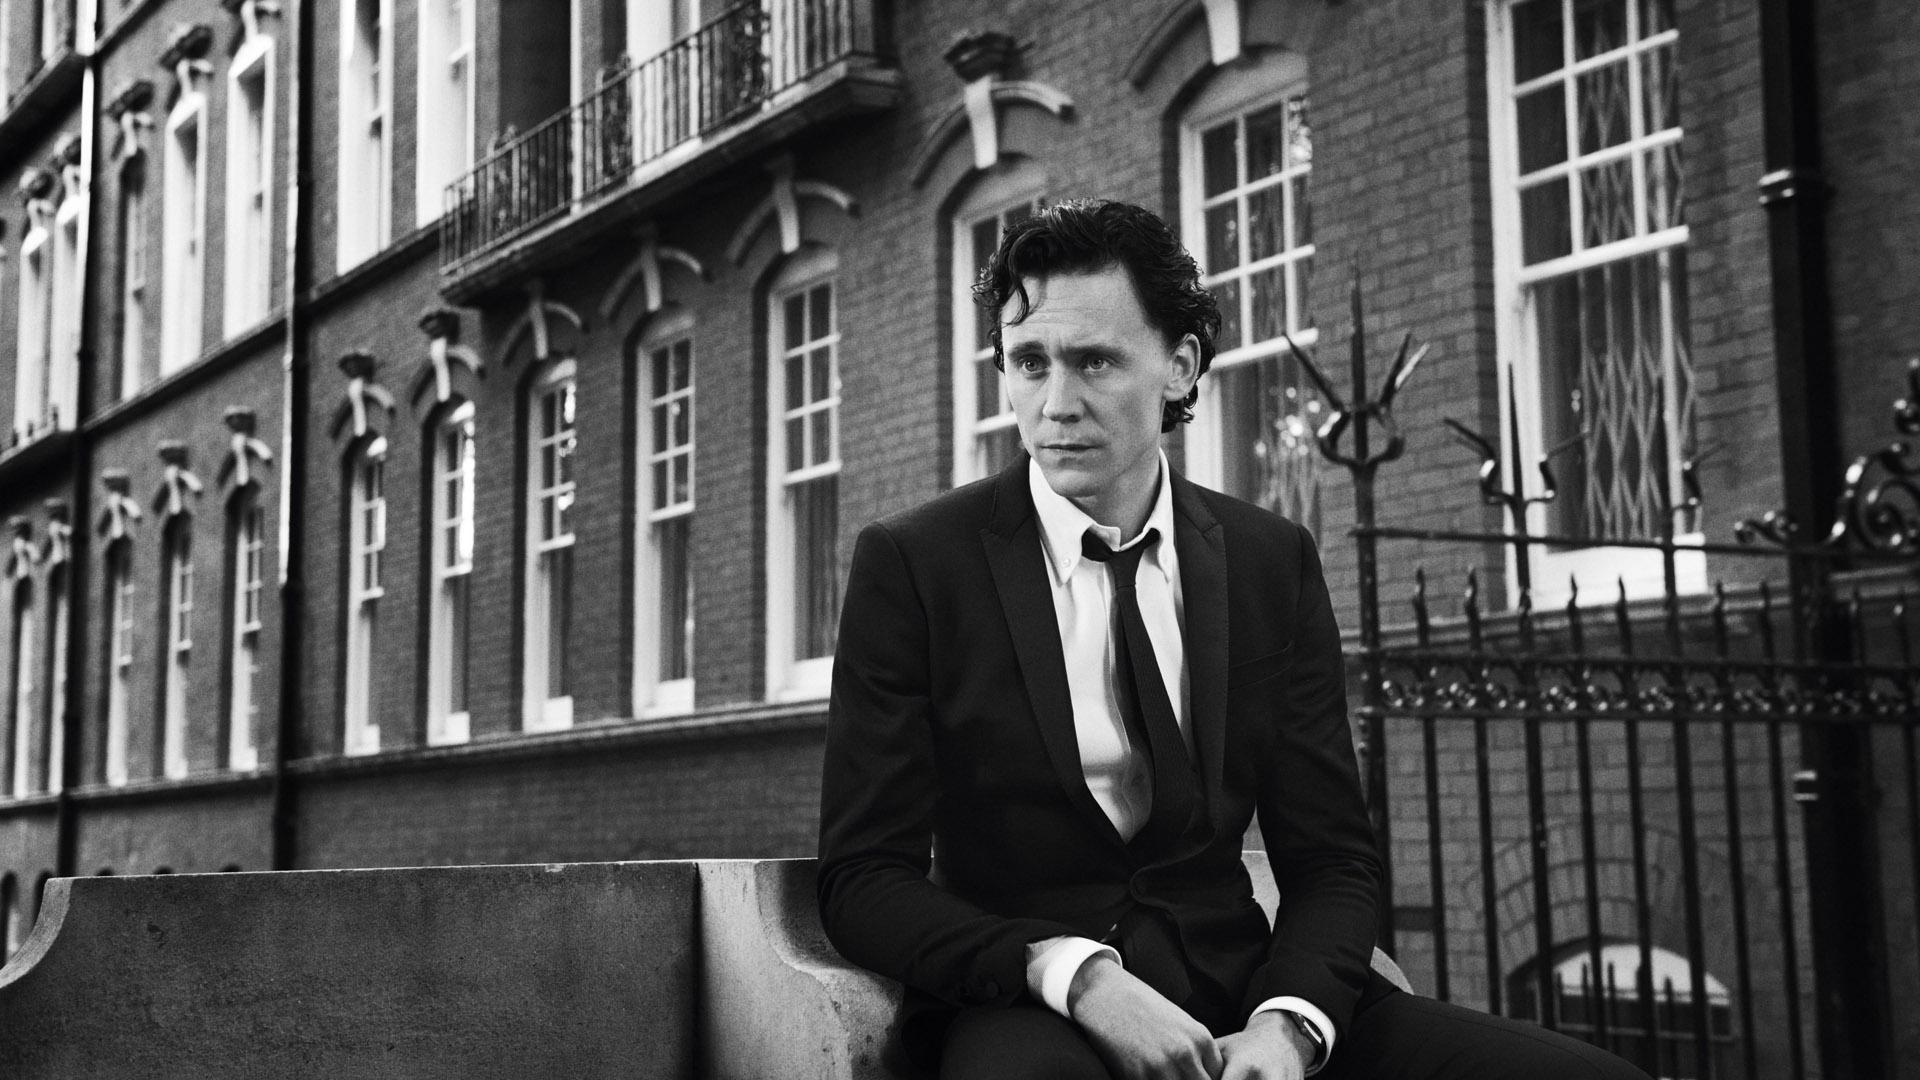 monochrome tom hiddleston celebrity wallpaper 55667